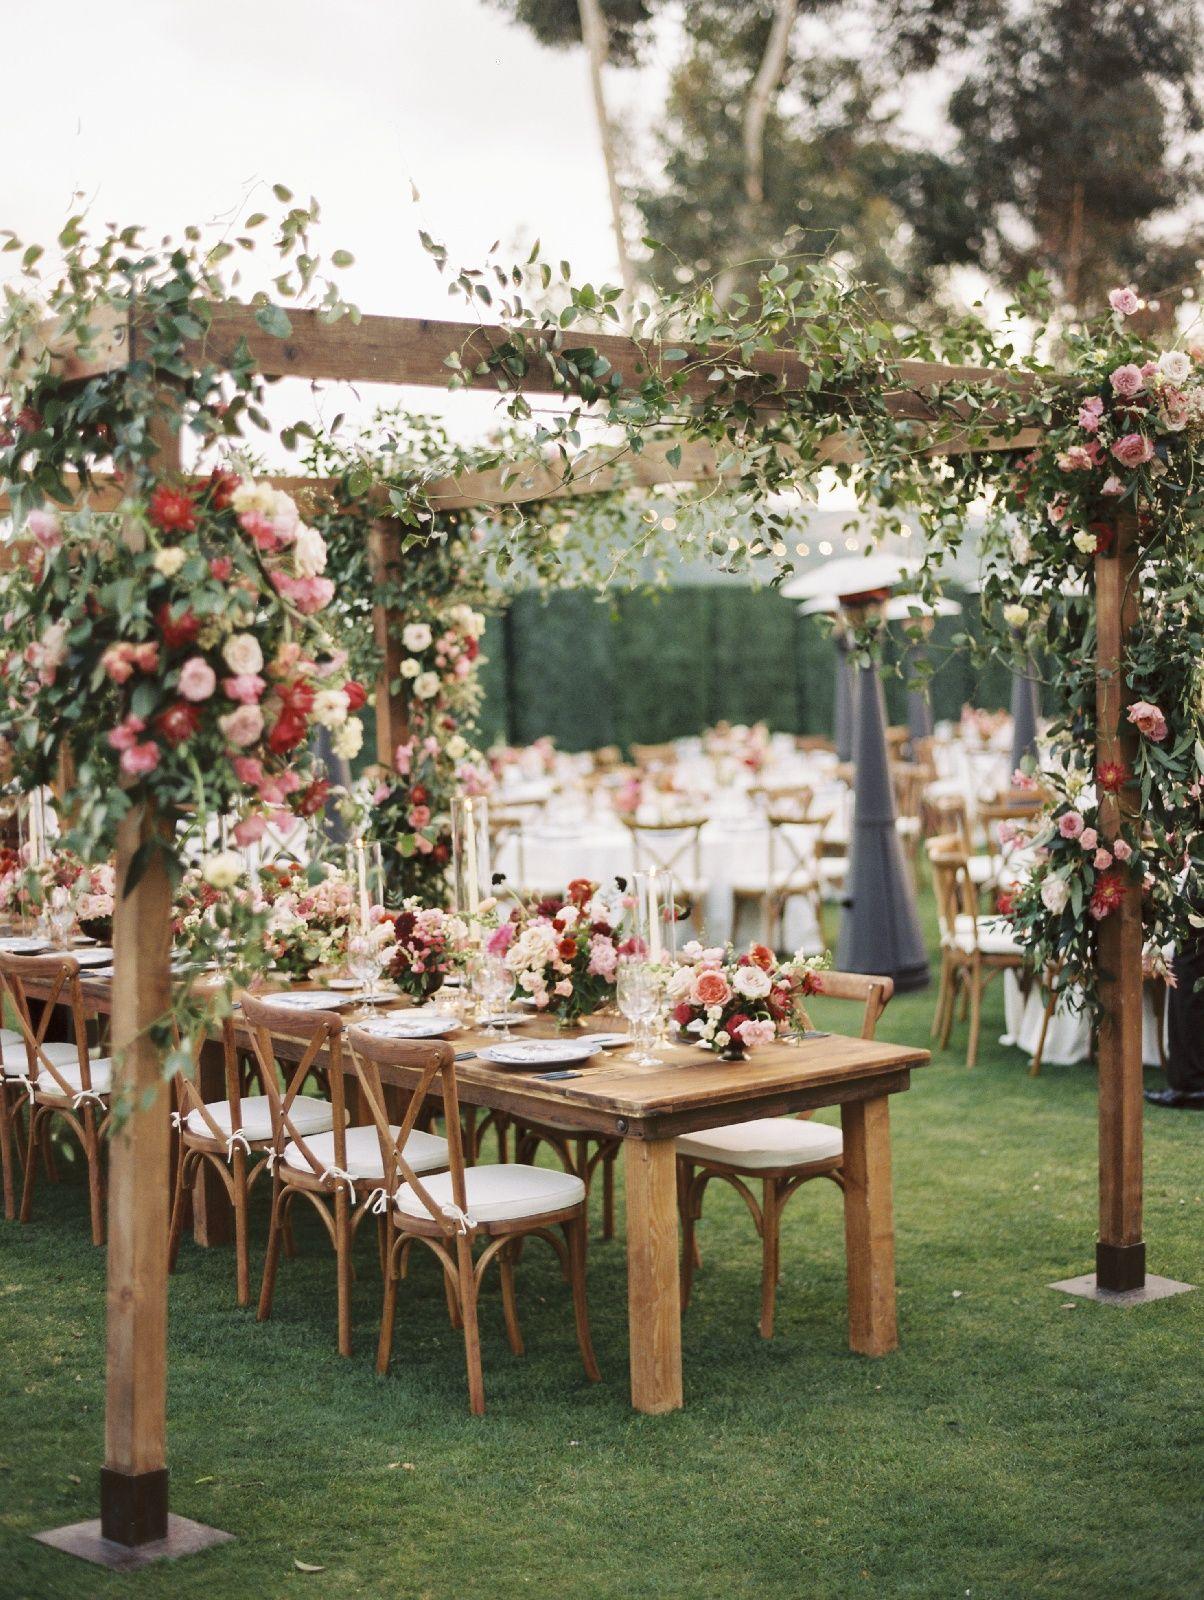 Farm Tables And More Rustic Table Decor Beachside Wedding Wedding Spot